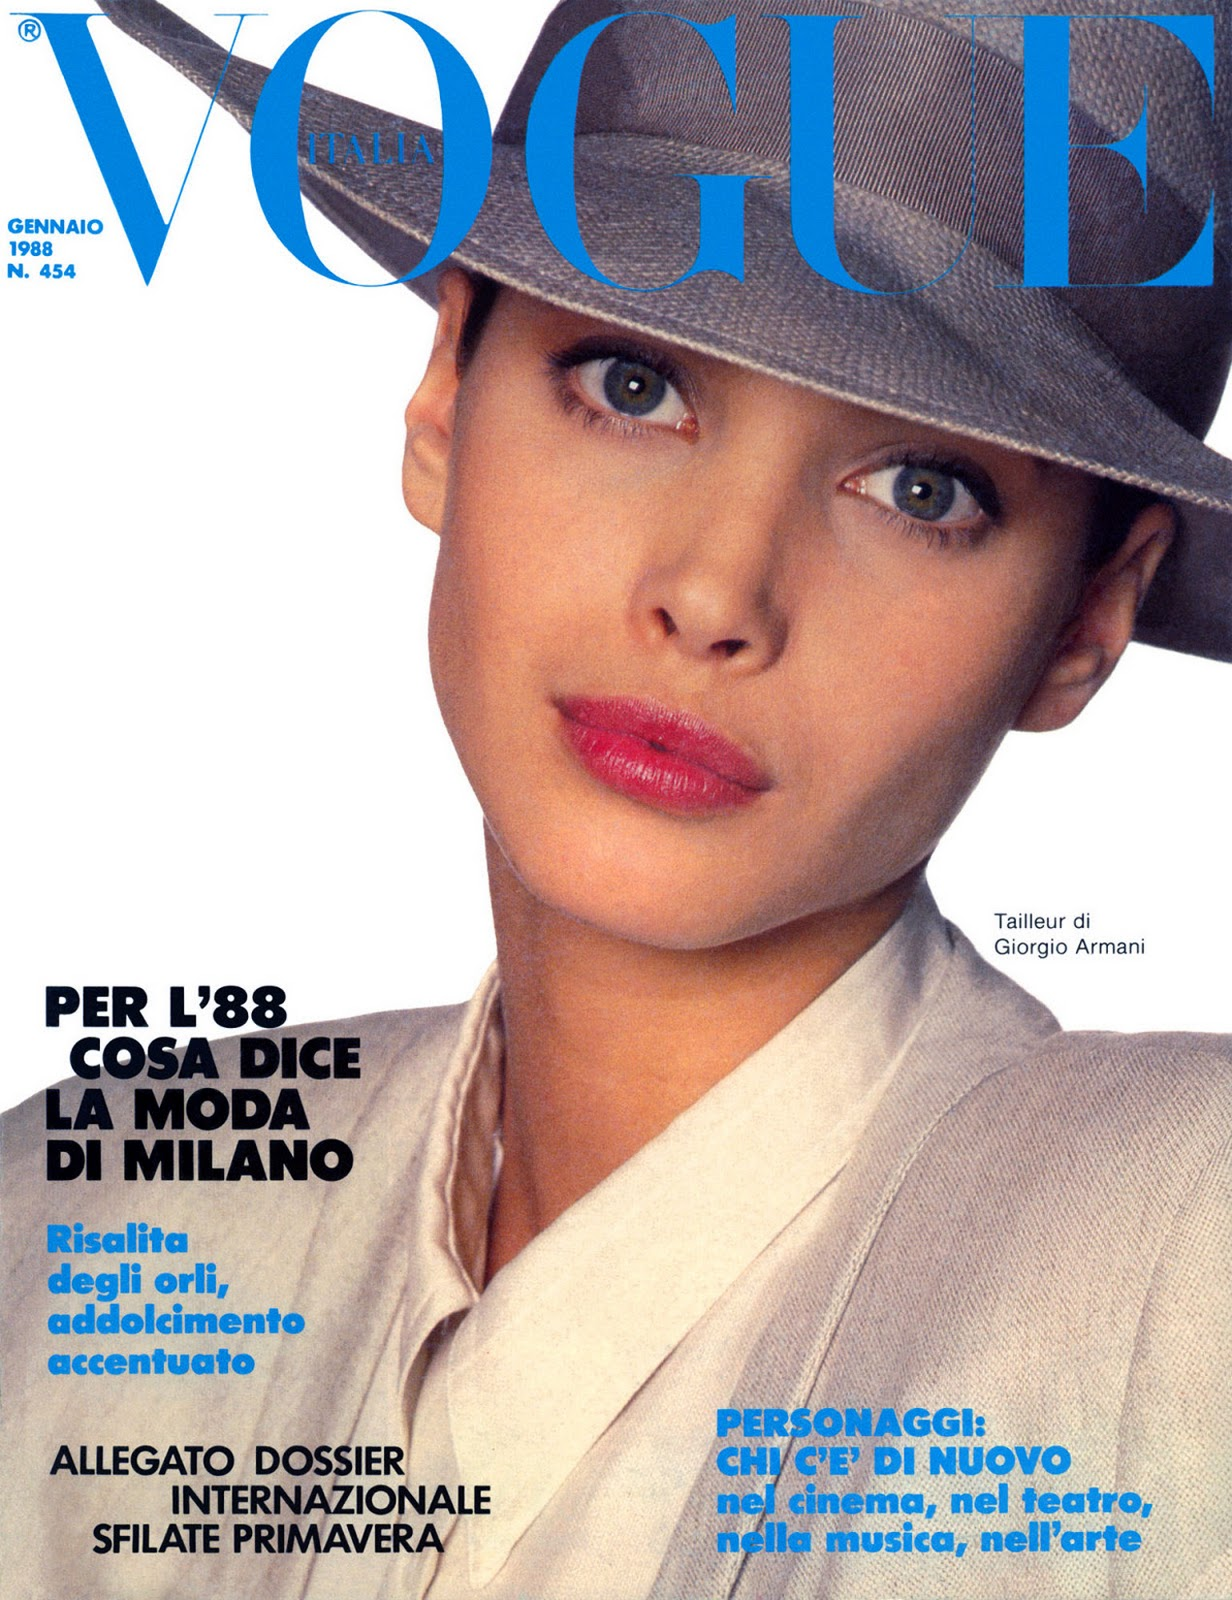 http://1.bp.blogspot.com/-aNltj9WjVUY/TV4bZPy5CXI/AAAAAAAACbE/S_Fl8QO3SoQ/s1600/1650-VOGUE-ITALIA-JANUARY-1988-VOGUE-SPIRIT-RESTORATION.jpg